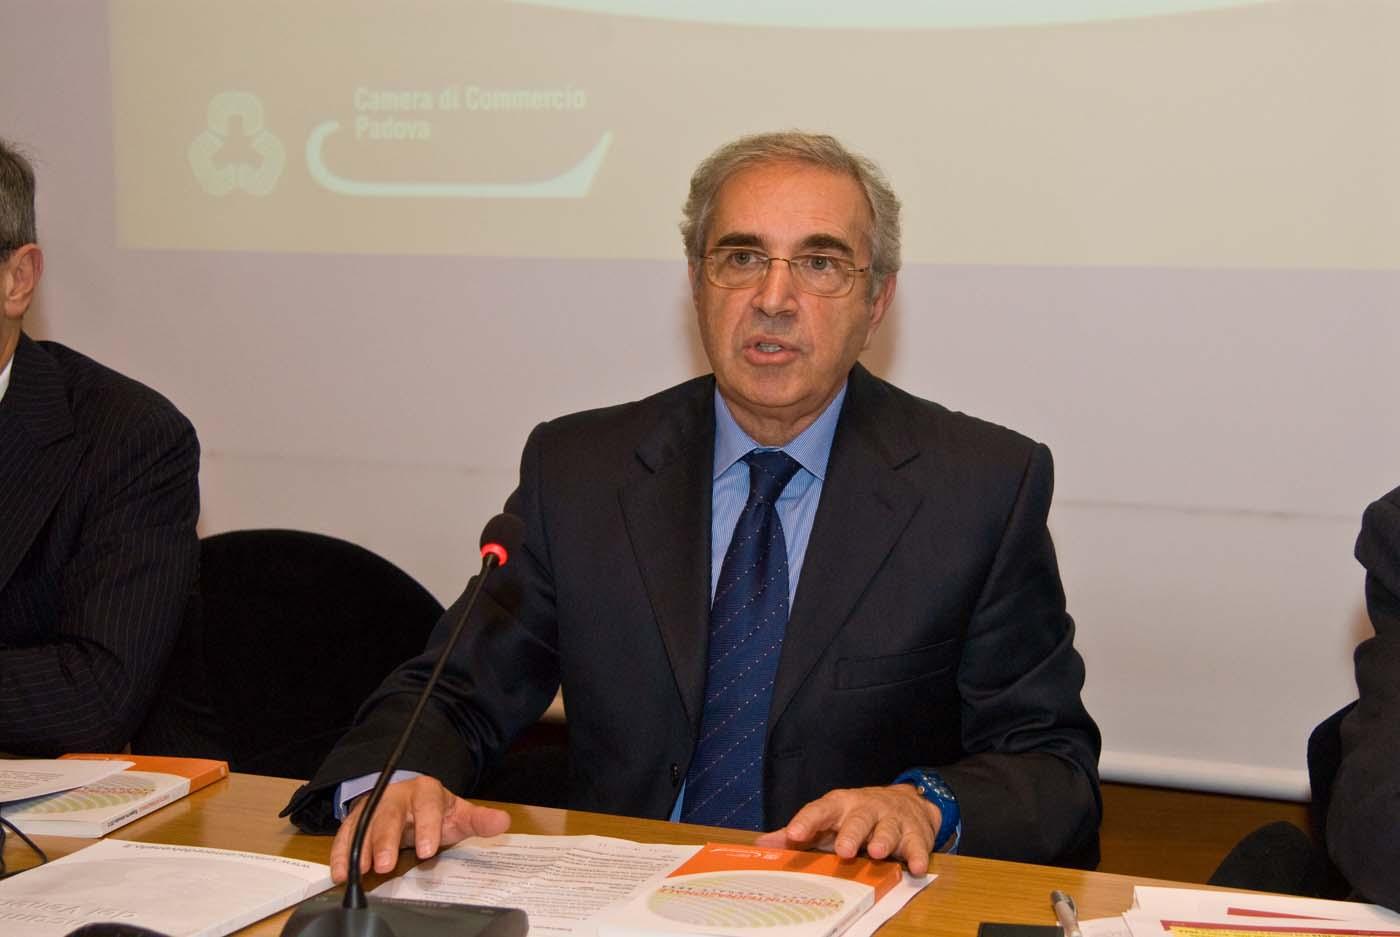 Fernando Zilio